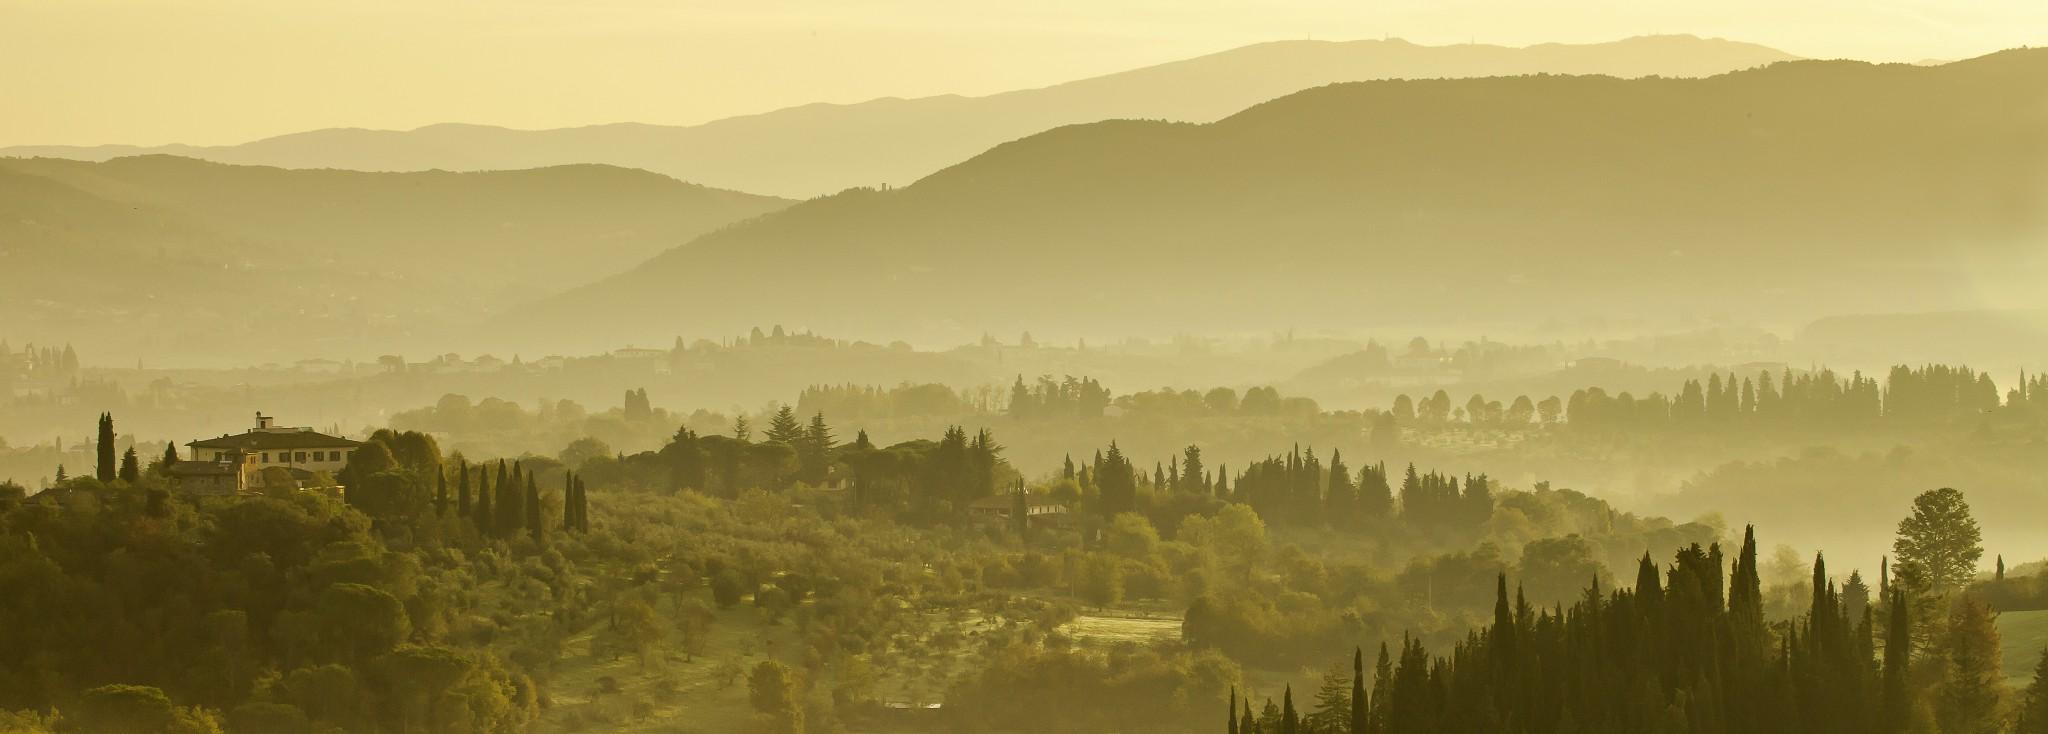 Sfumato, Toskana